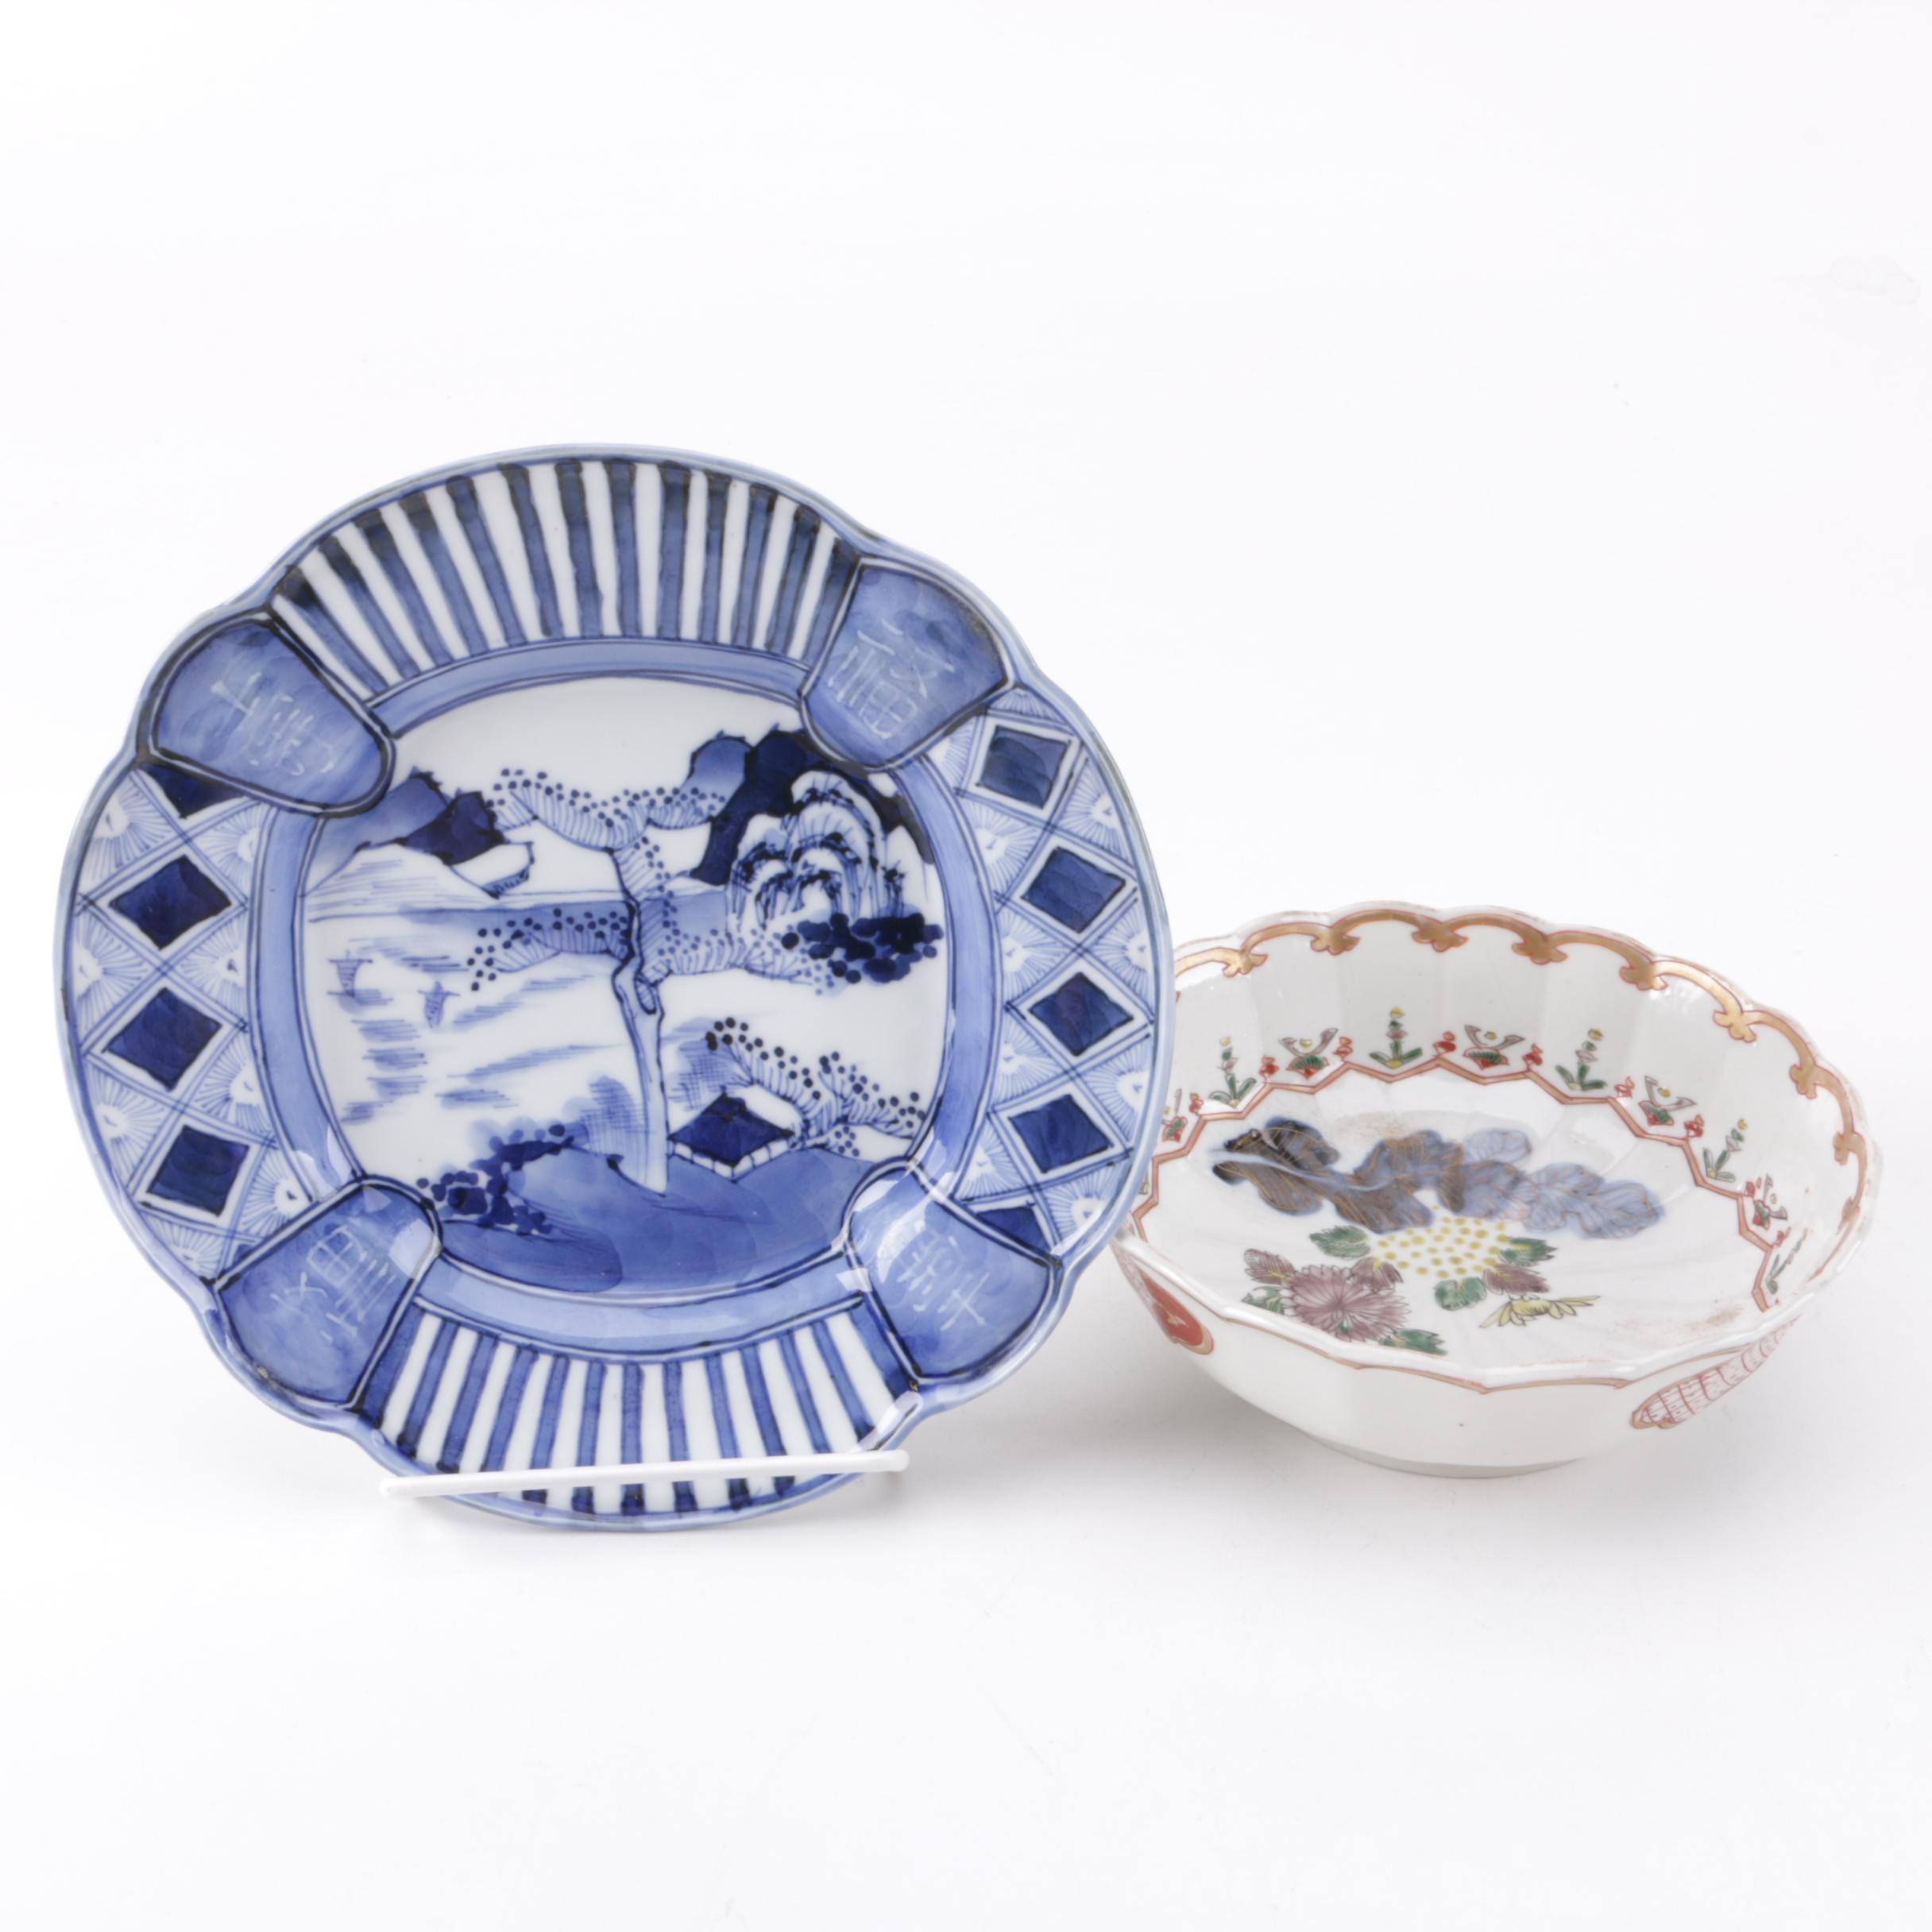 Pair of Porcelain Tableware